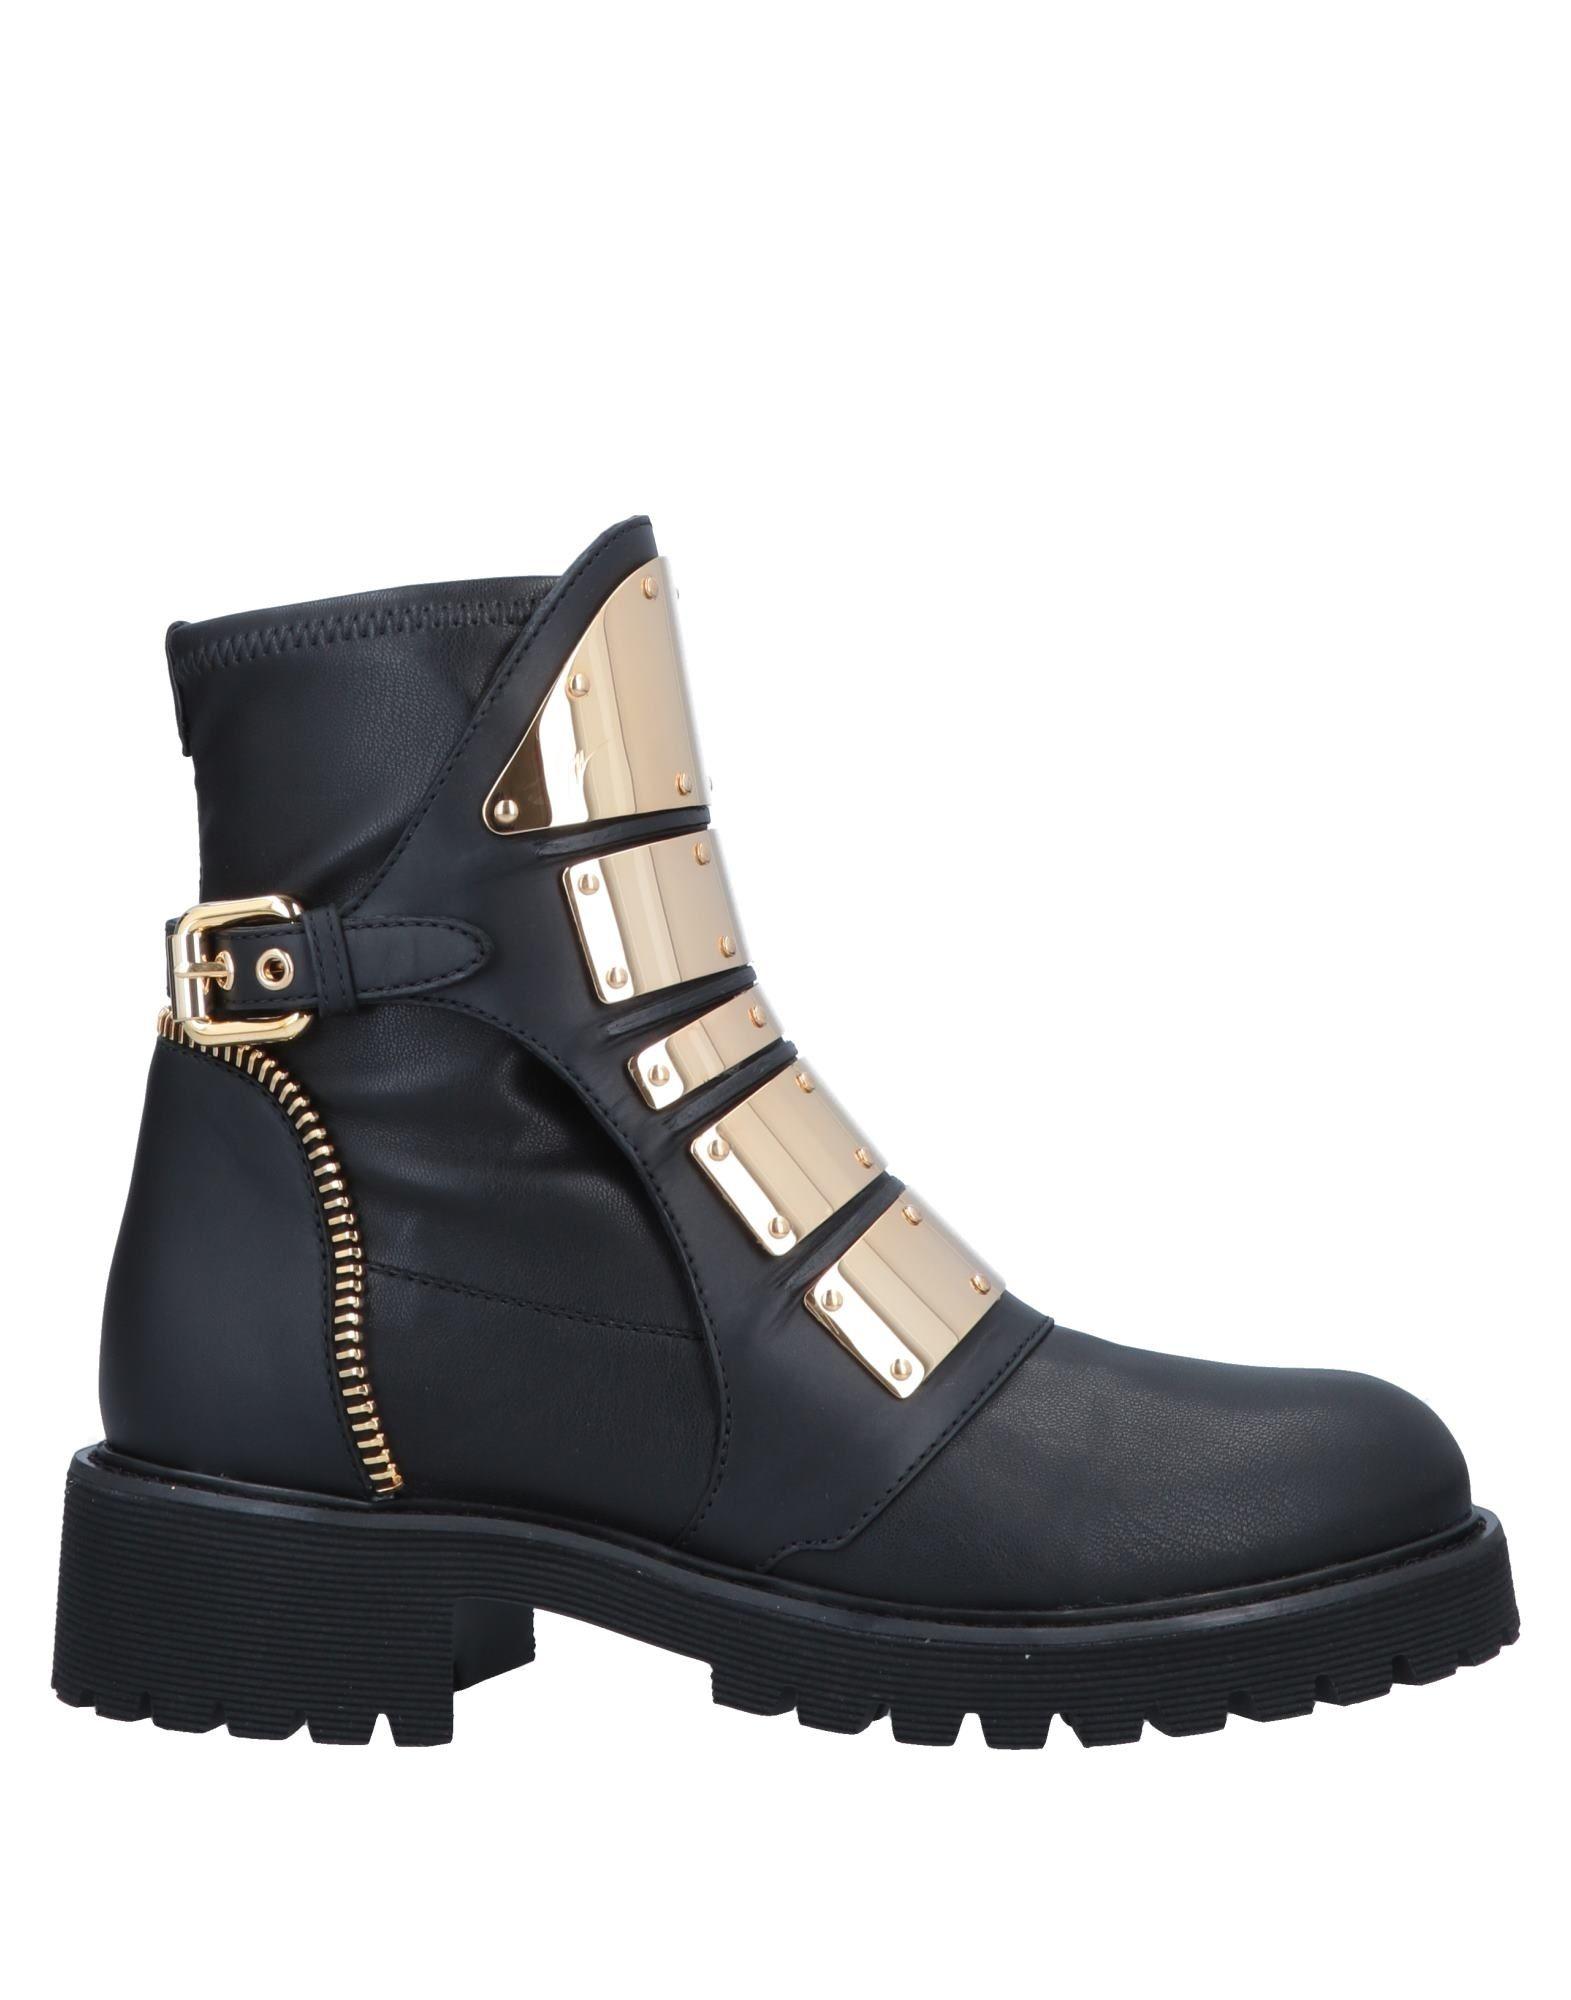 GIUSEPPE ZANOTTI Полусапоги и высокие ботинки демисезонные ботинки giuseppe zanotti design fa150513 hk 15